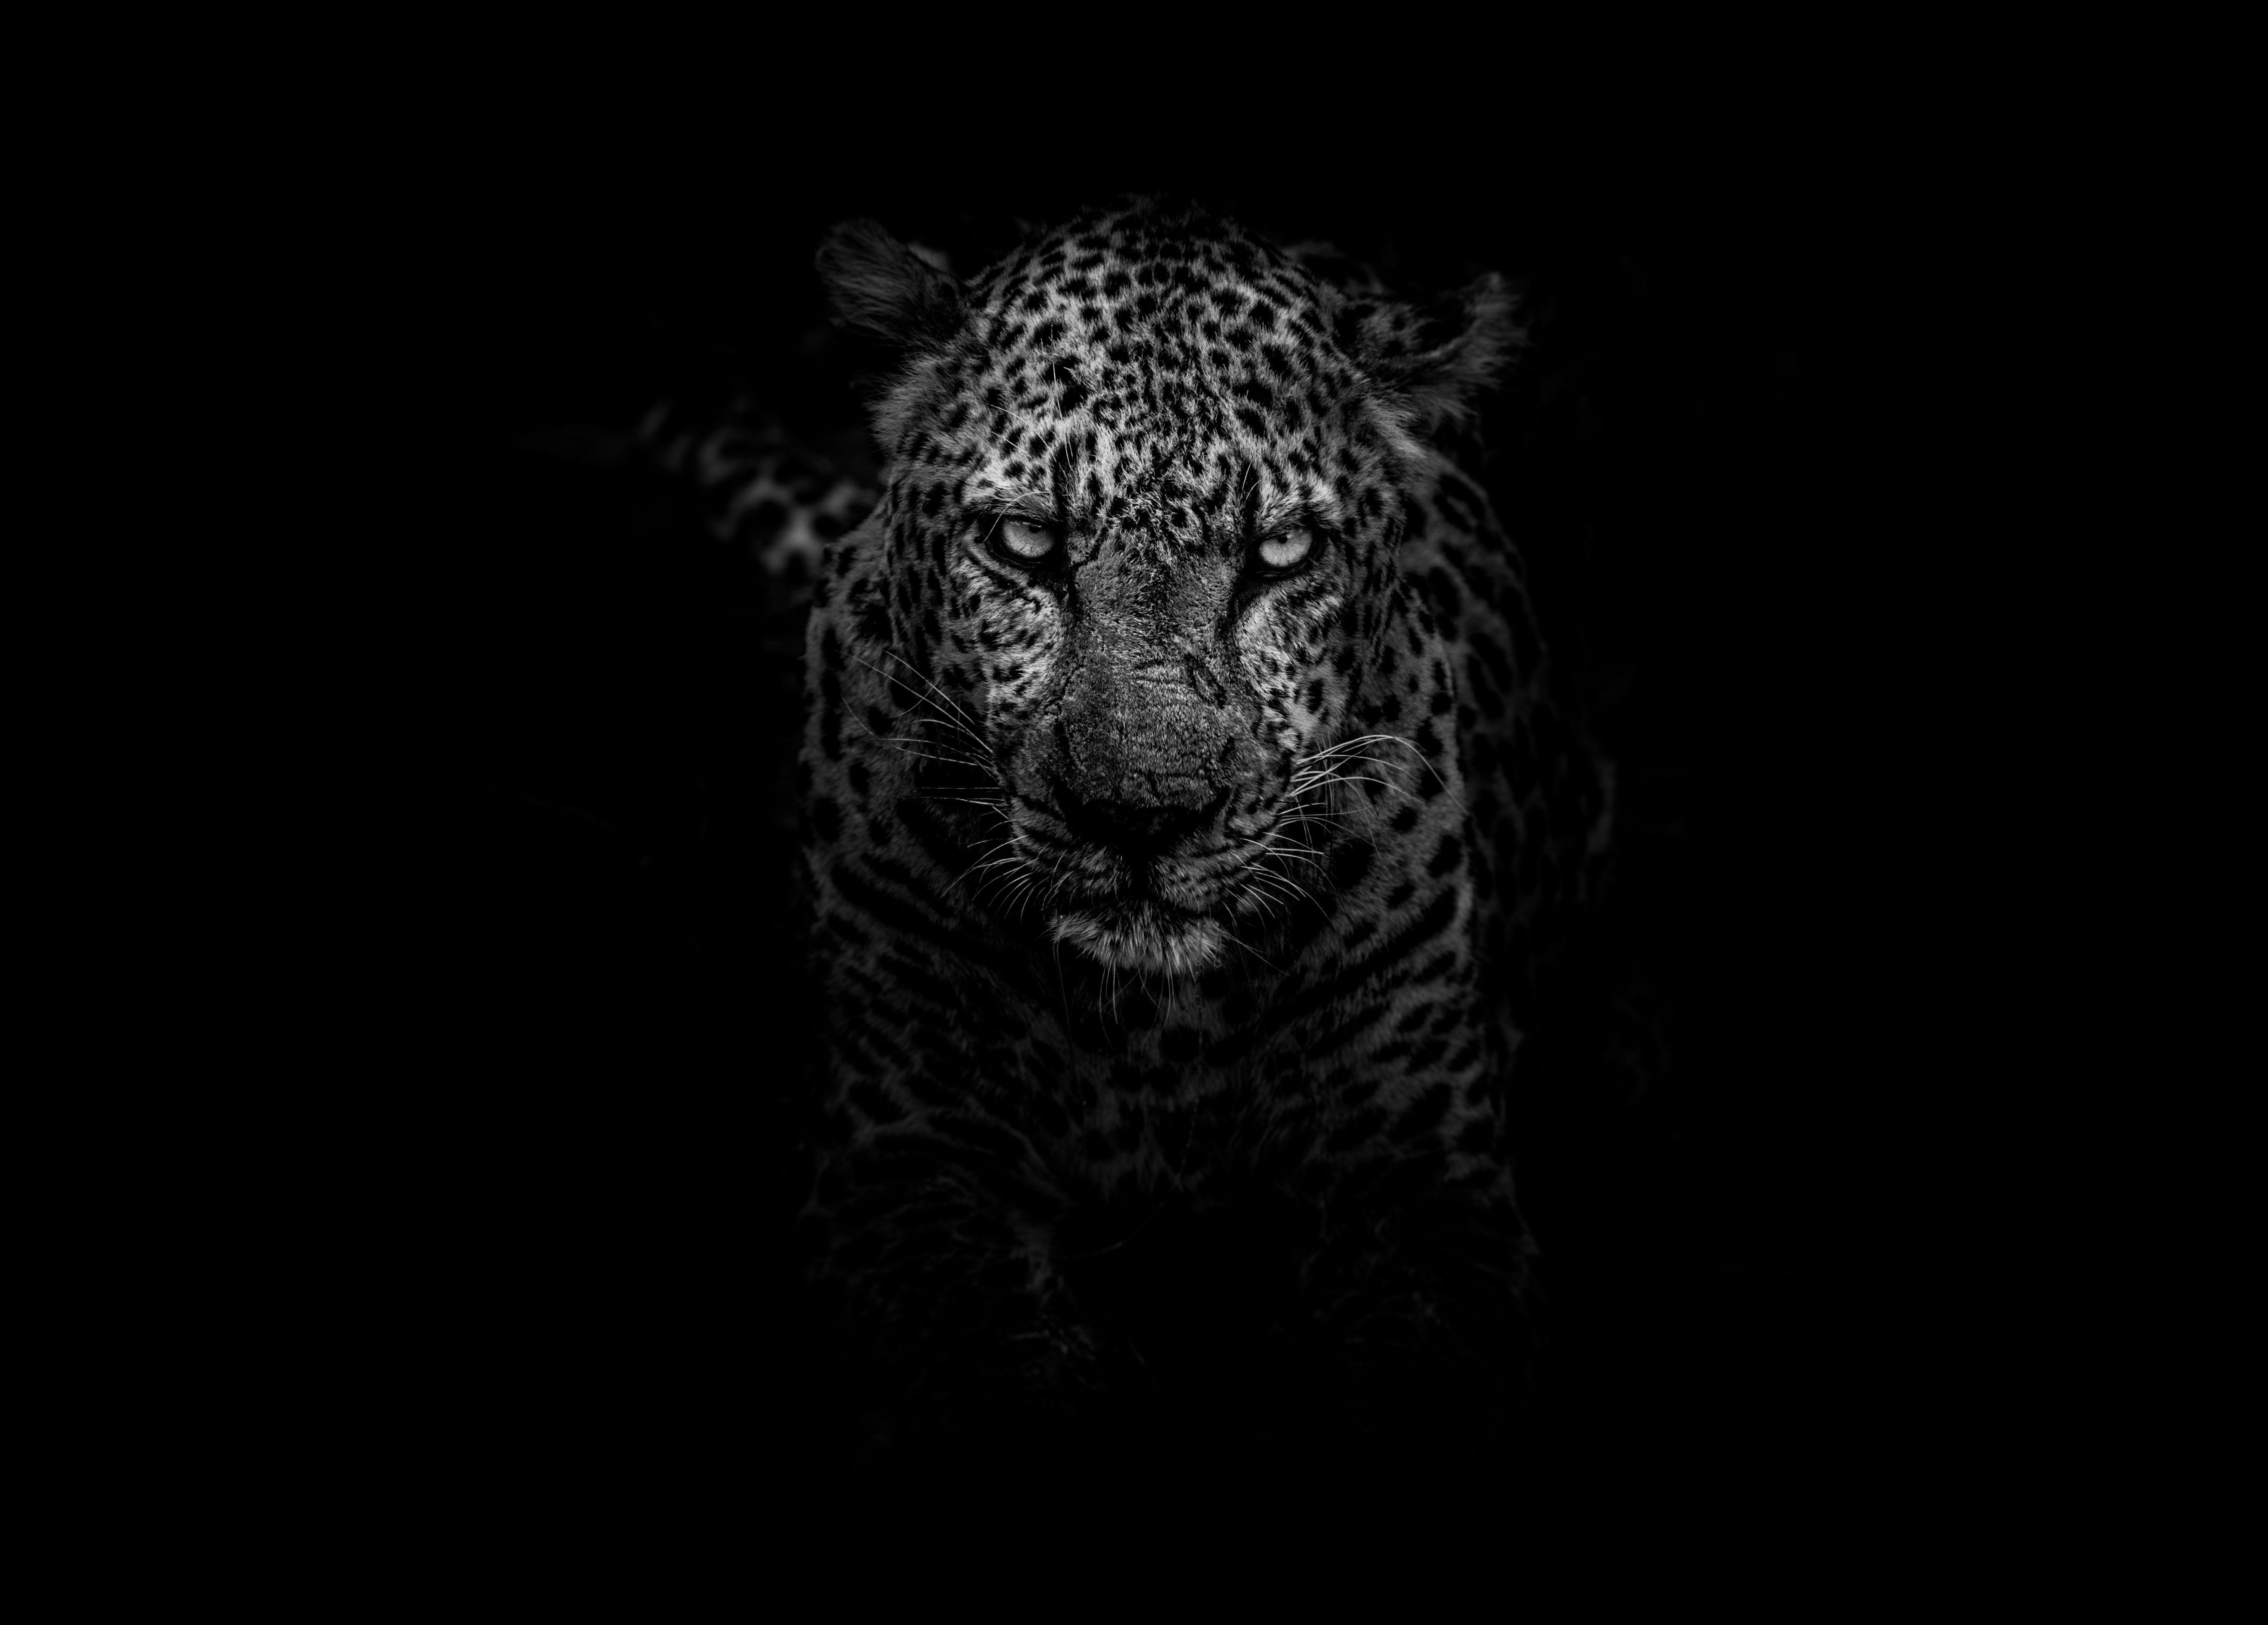 Leopard Animals Dark Hd Monochrome Black And White 4k 5k 5k Wallpaper Hdwallpaper Desktop In 2020 Leopard Pictures Animal Wallpaper Jaguar Animal